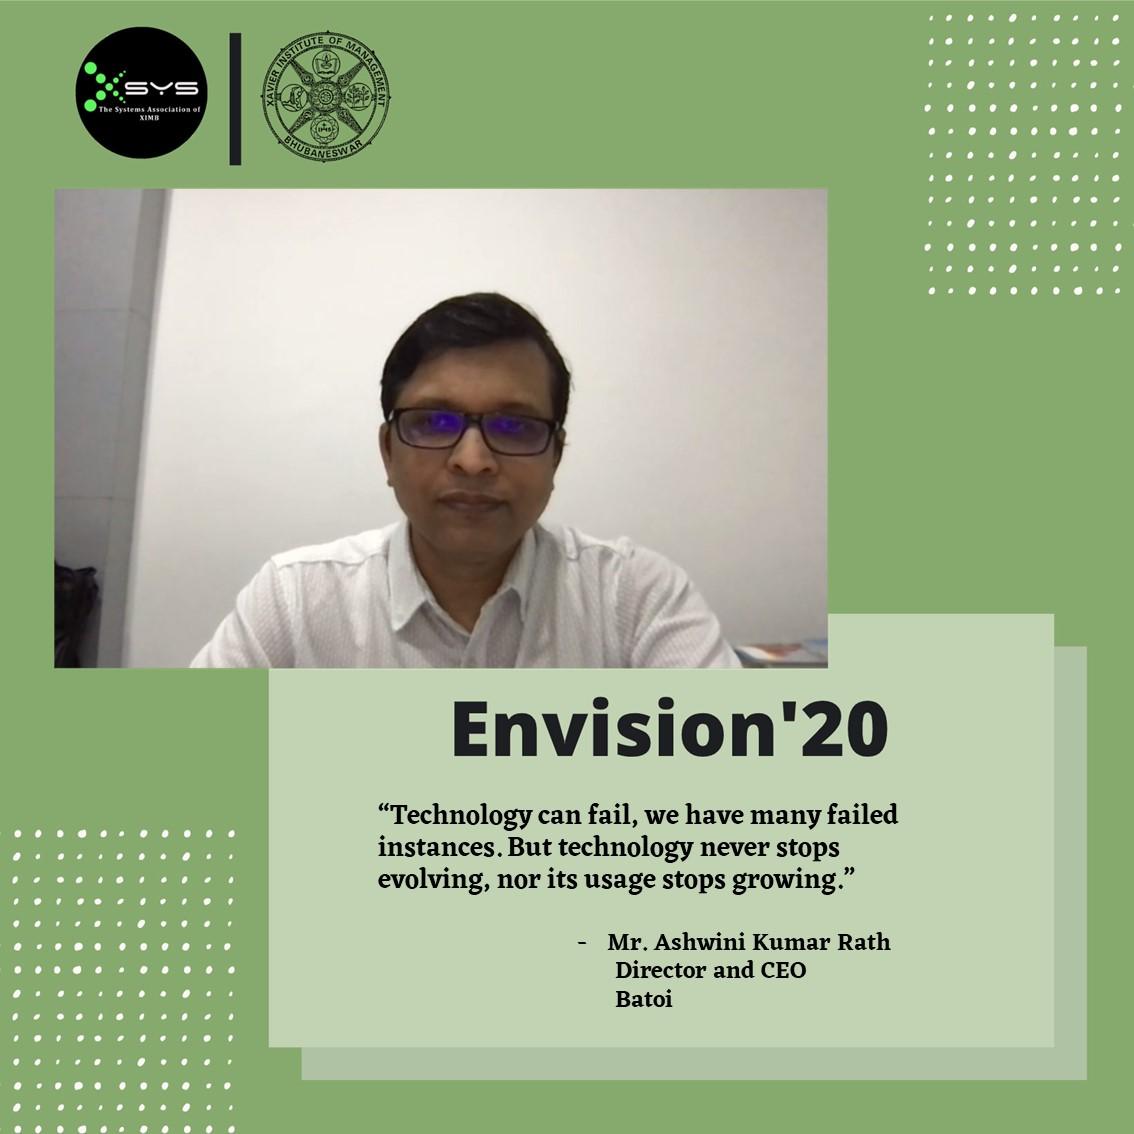 Speaking at XIMB Envision 2020